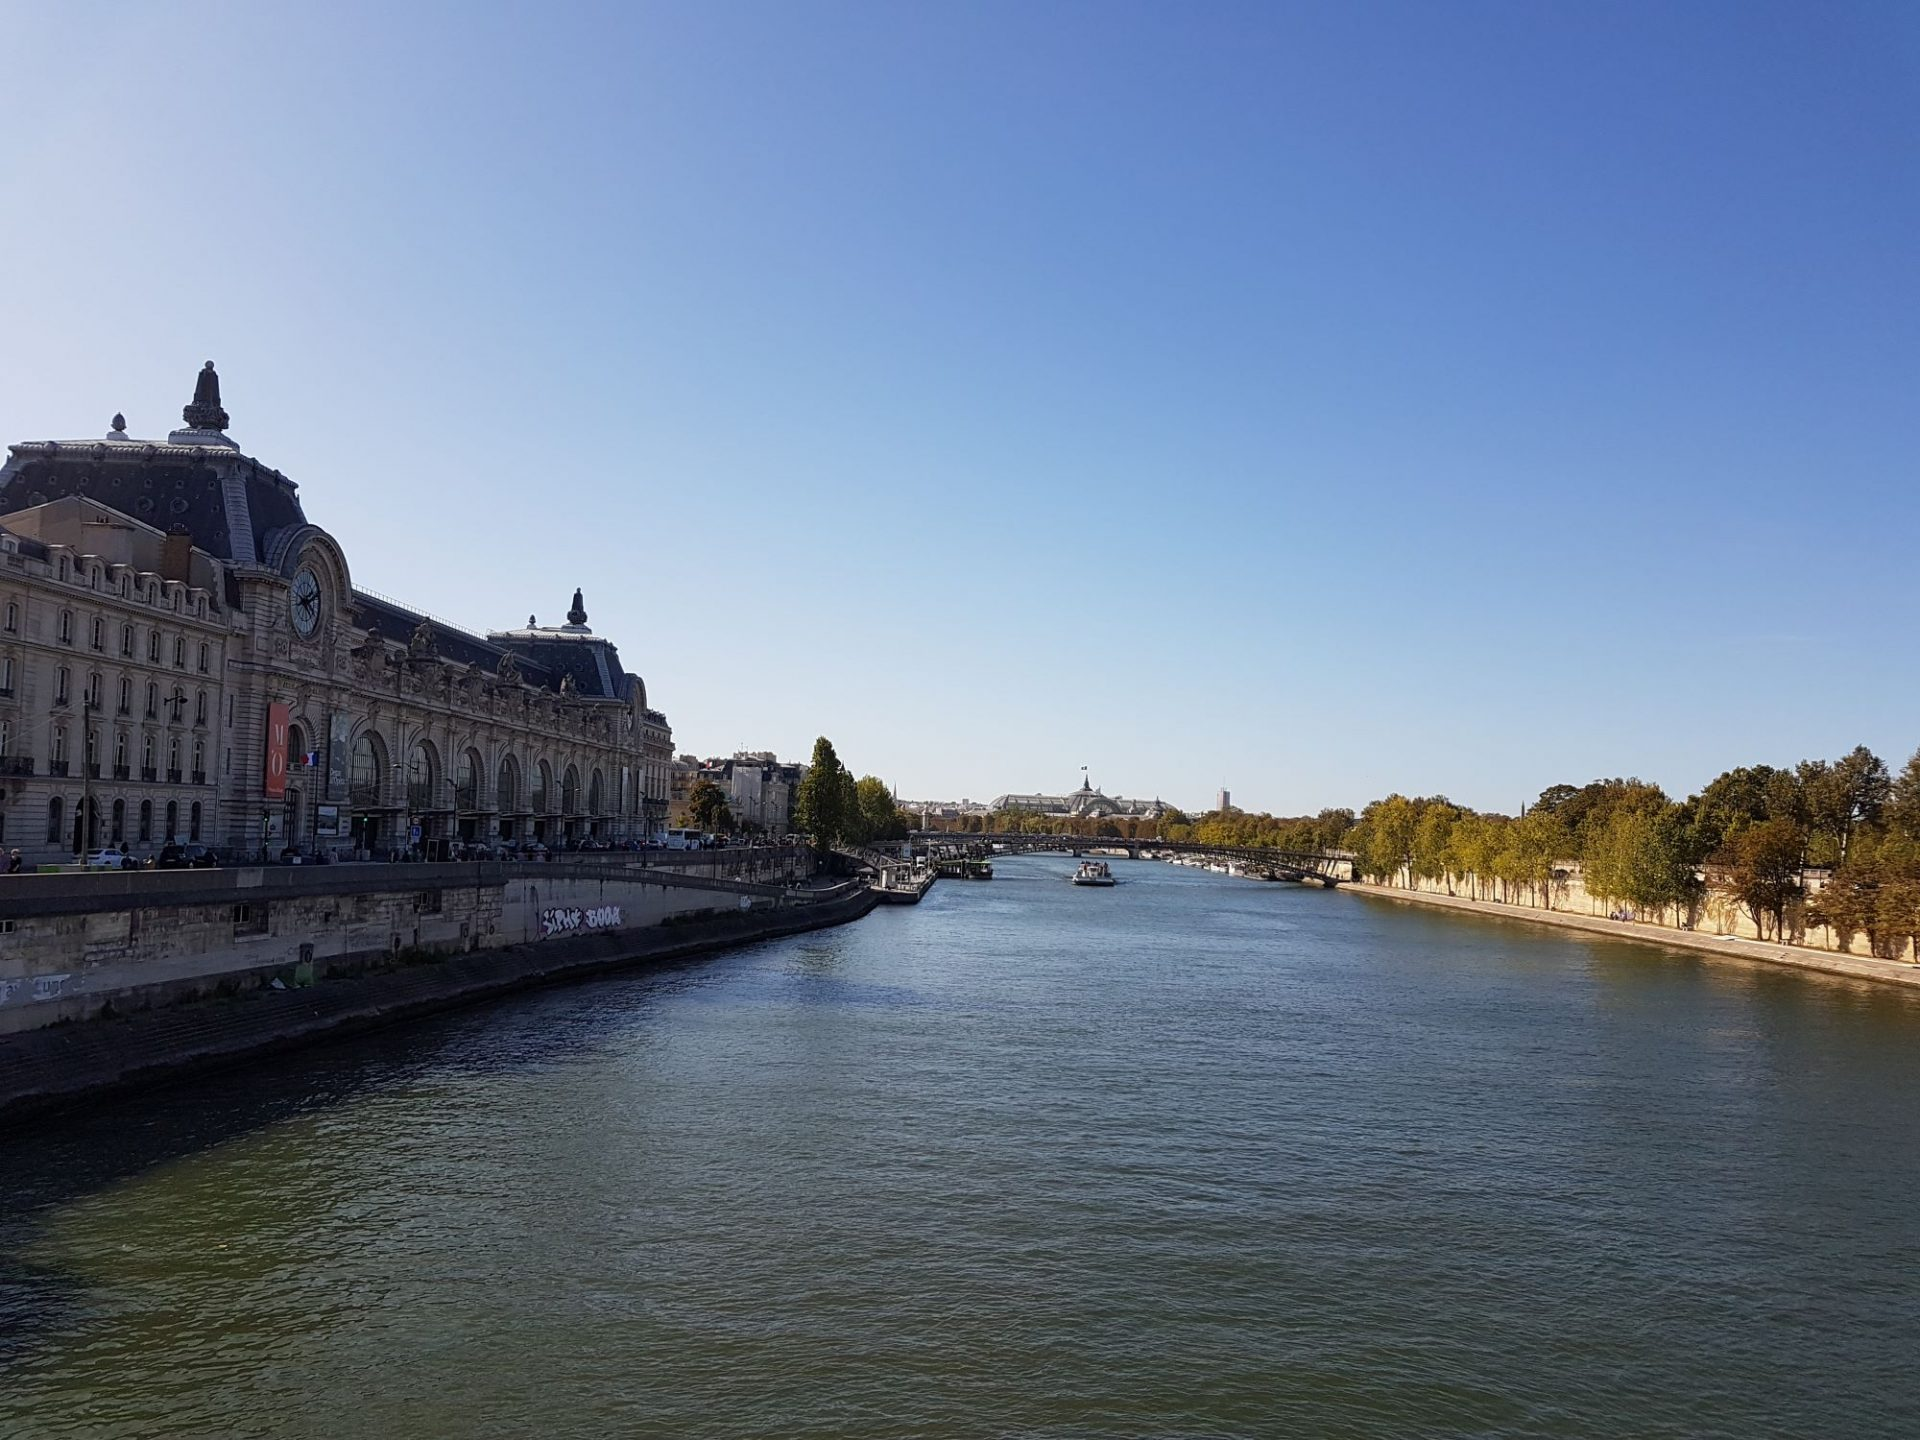 Музей Орсе, Париж, Франция. Сентябрь, 2019